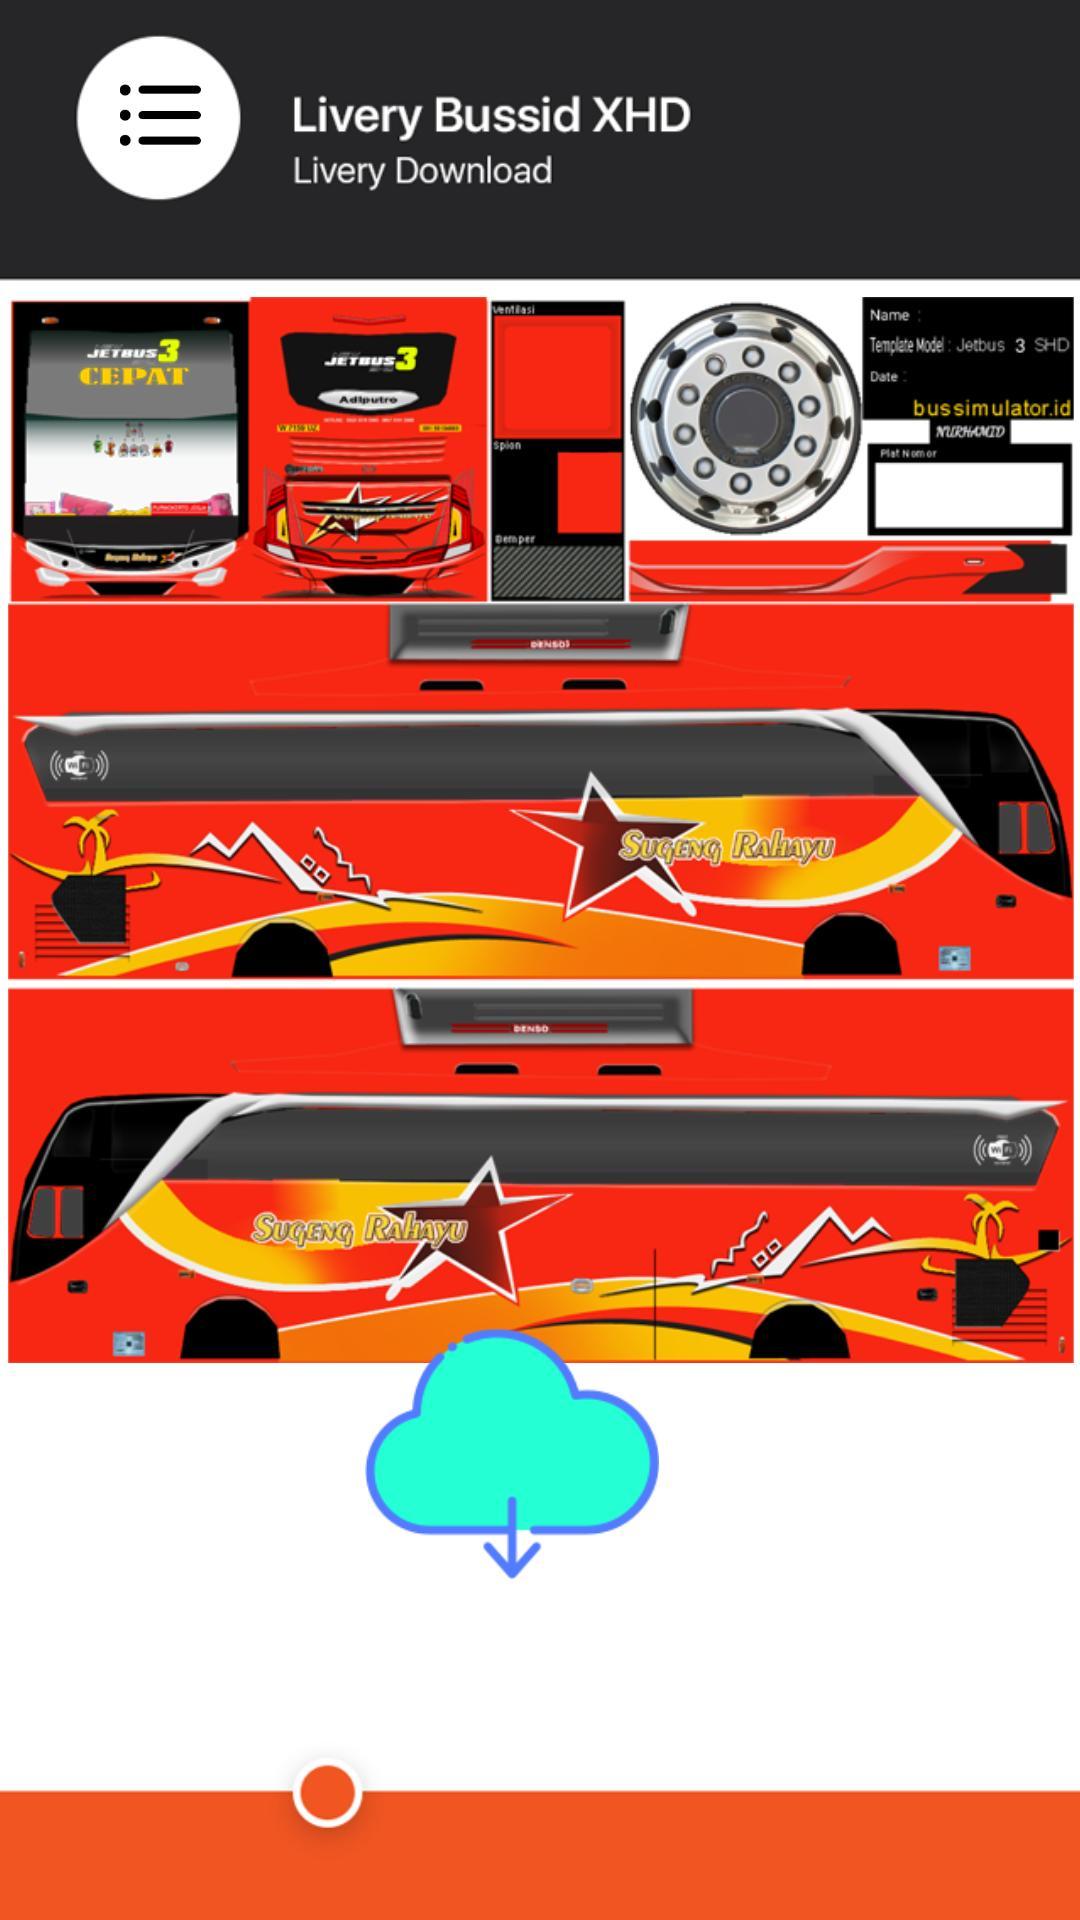 Livery Bussid Shd Bus Sumatera Infotiket Com